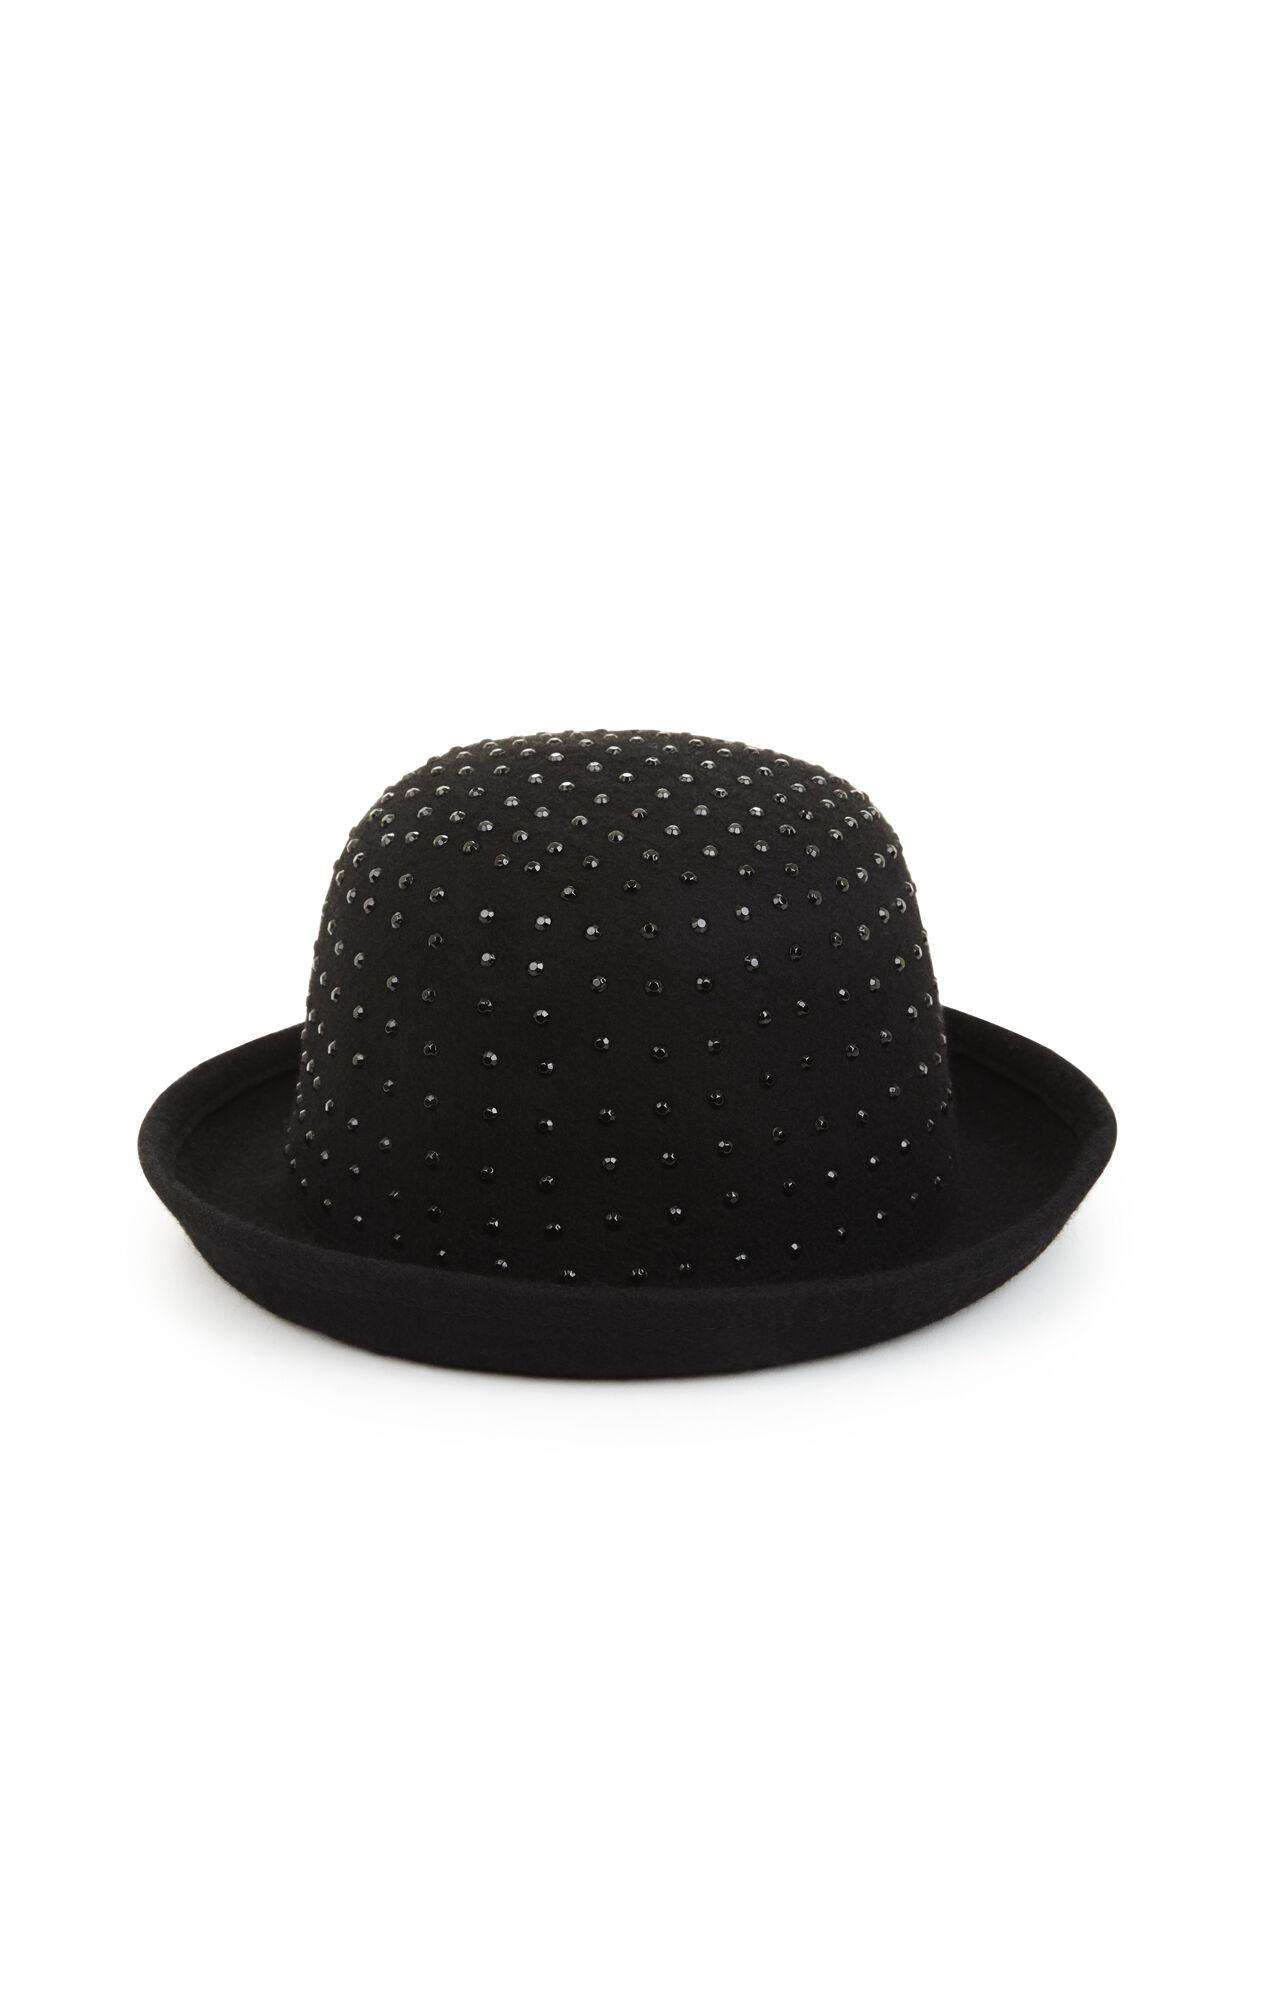 Diamonte Bowler Hat